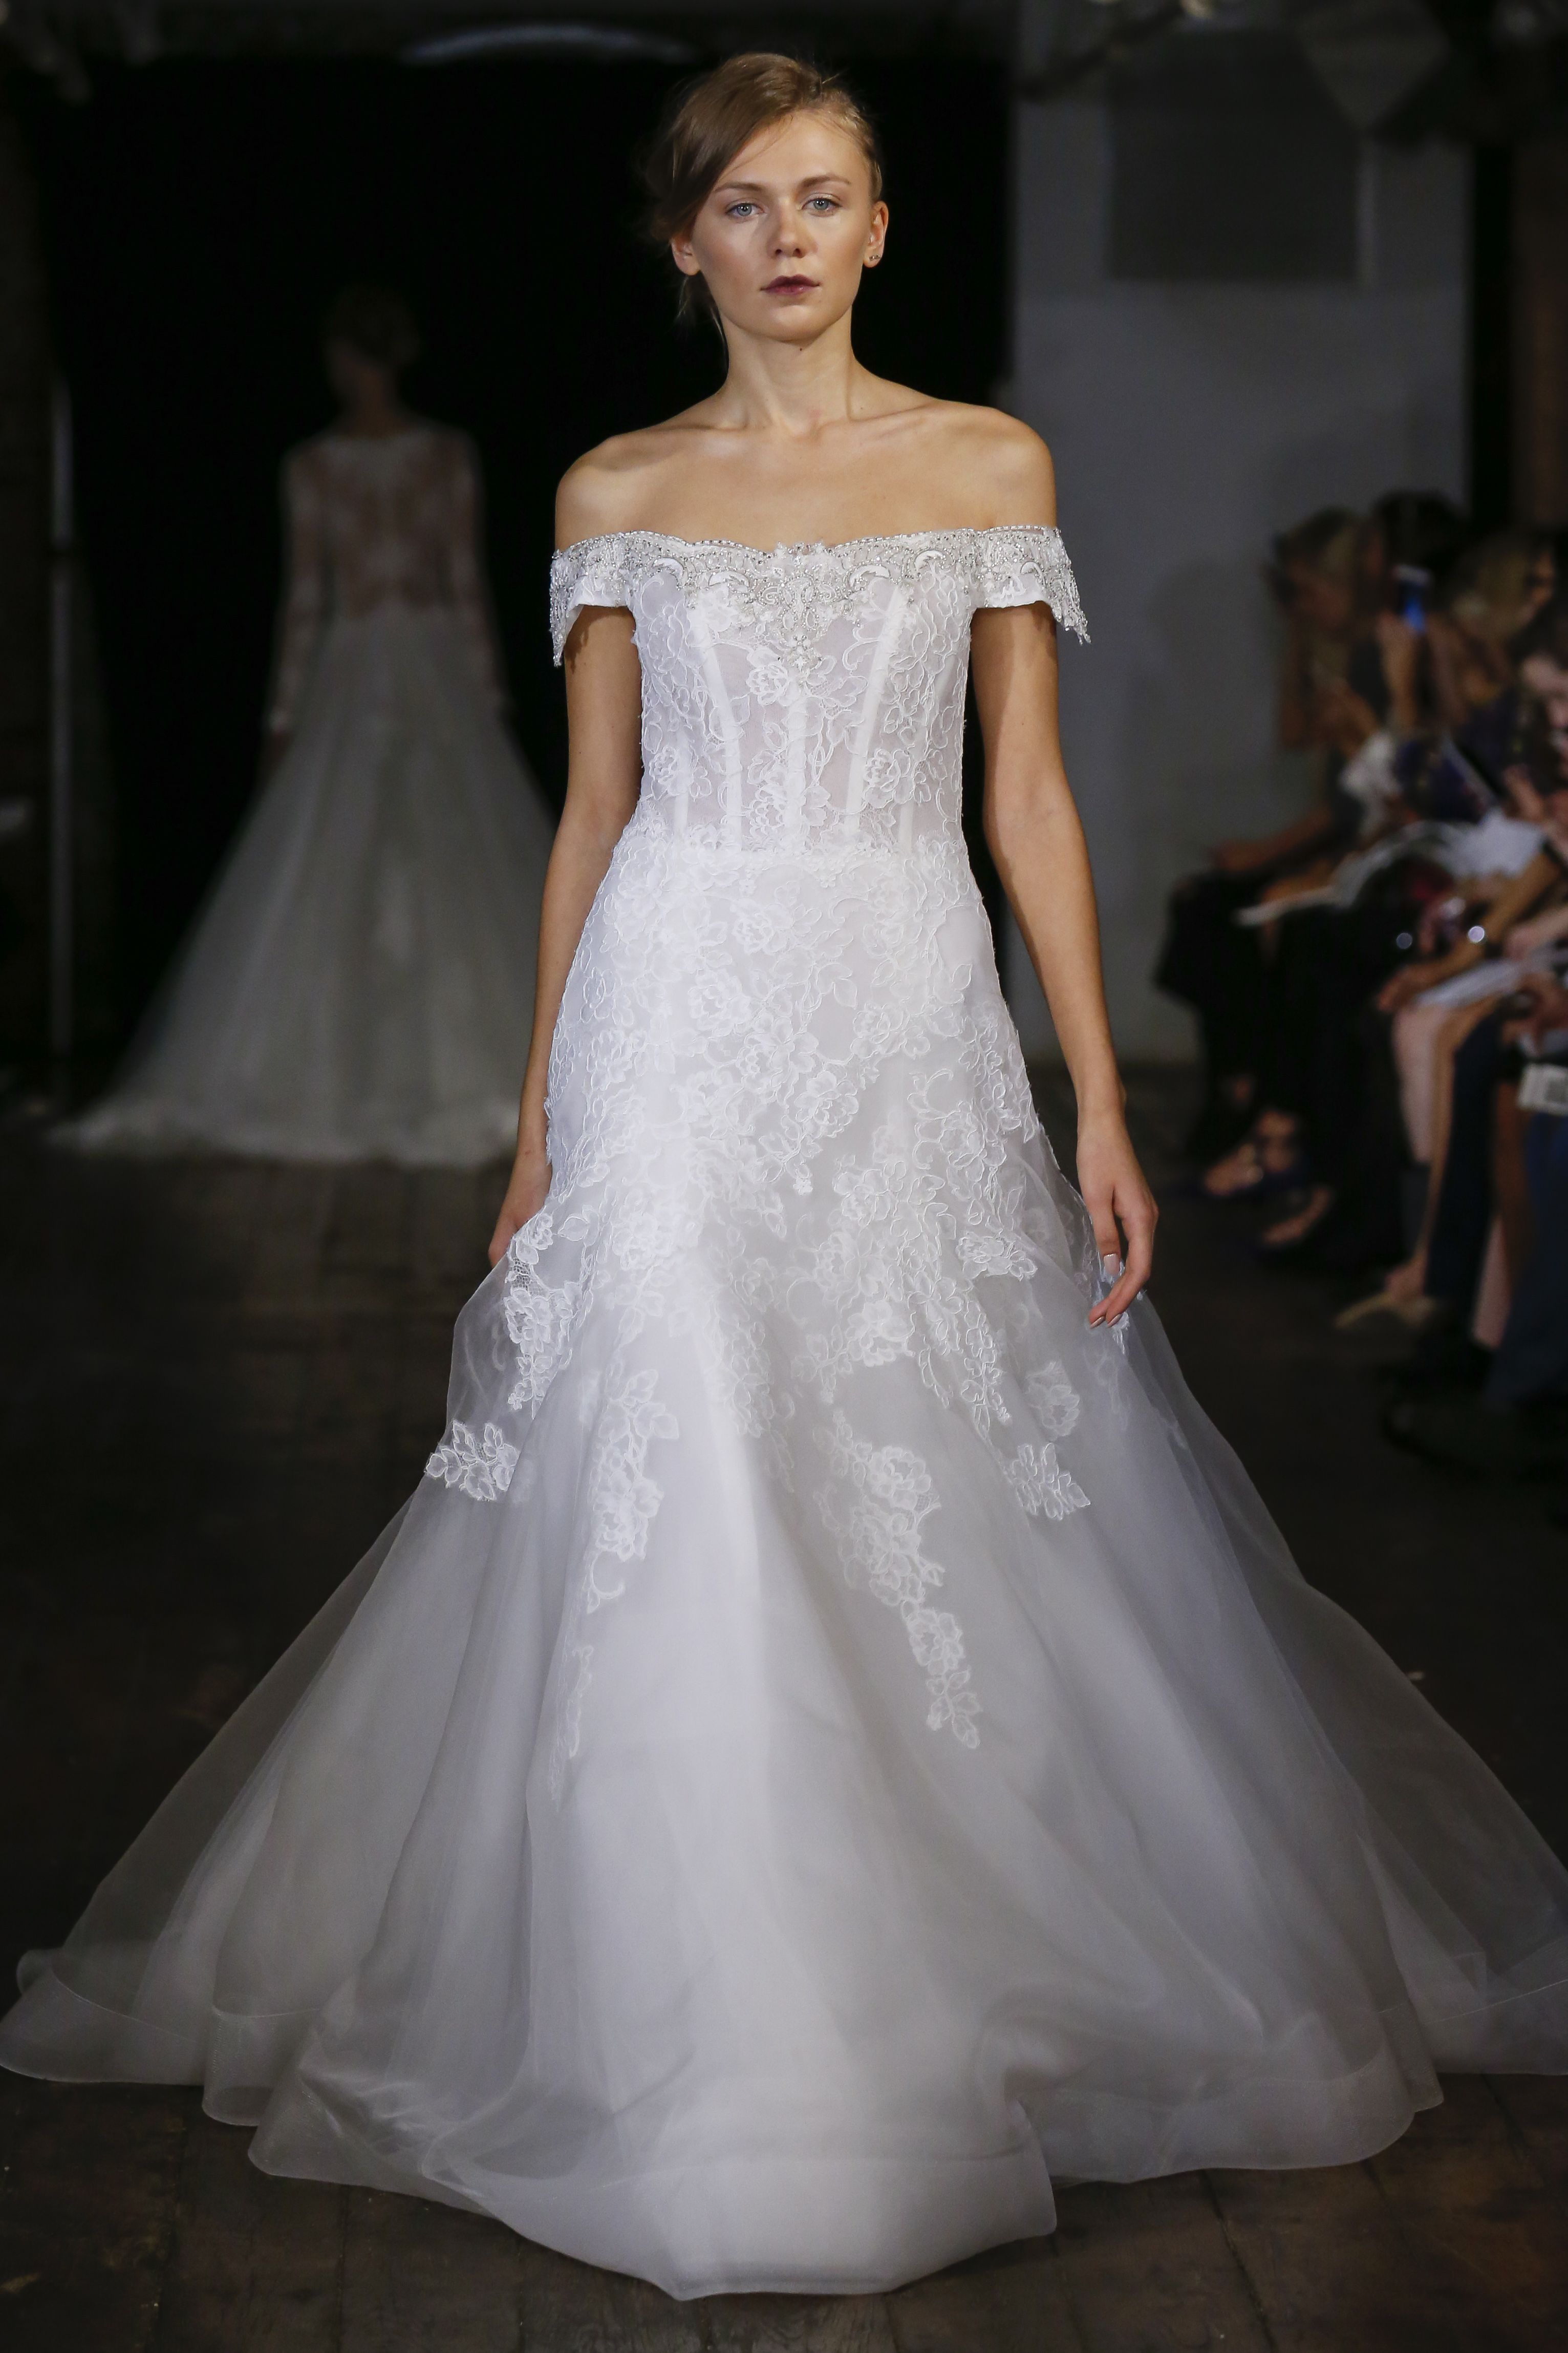 Wedding Wedding Dresses Orlando a line lace and embroidered wedding dress from rivini by rita vinieris fallwinter